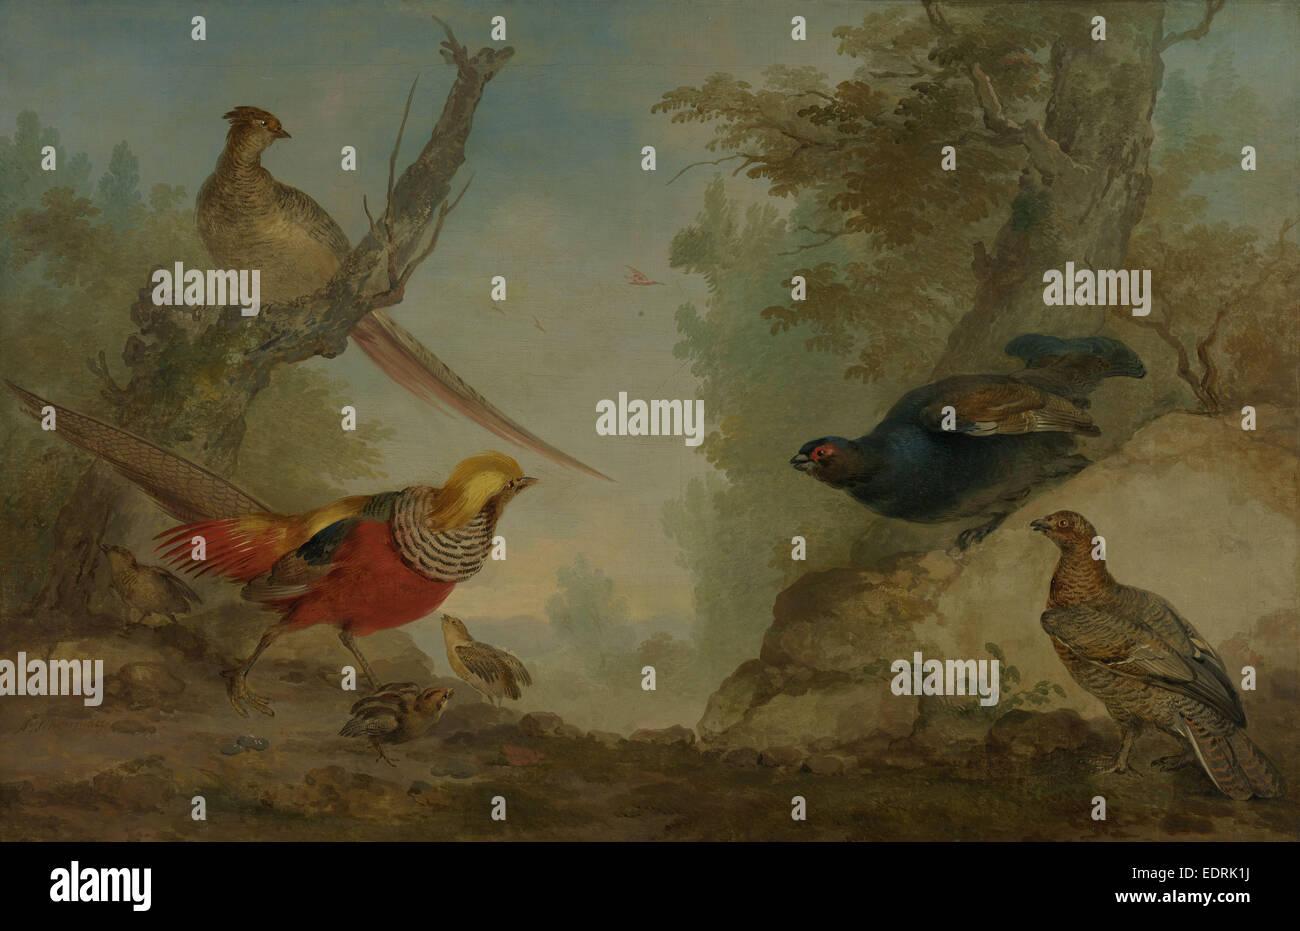 Pheasants, Aert Schouman, 1730 - 1760 - Stock Image